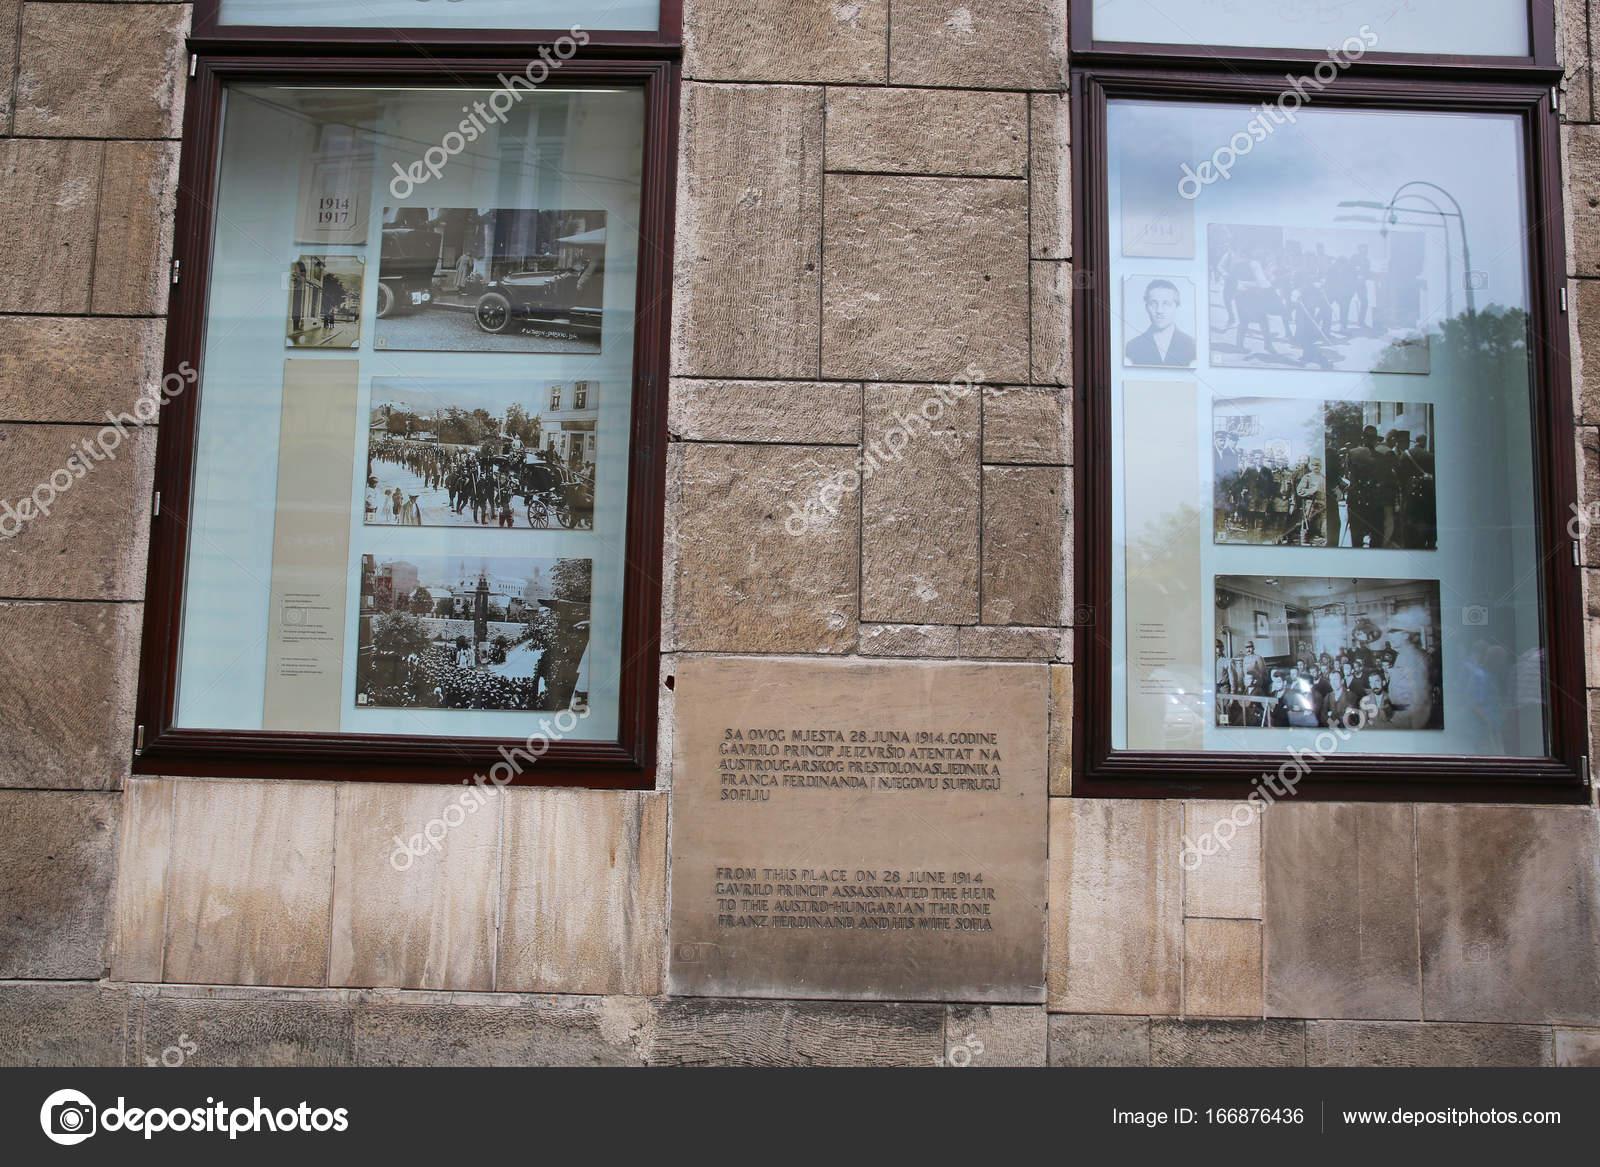 Site Of Franz Ferdinands Assassination Sarajevo Stock